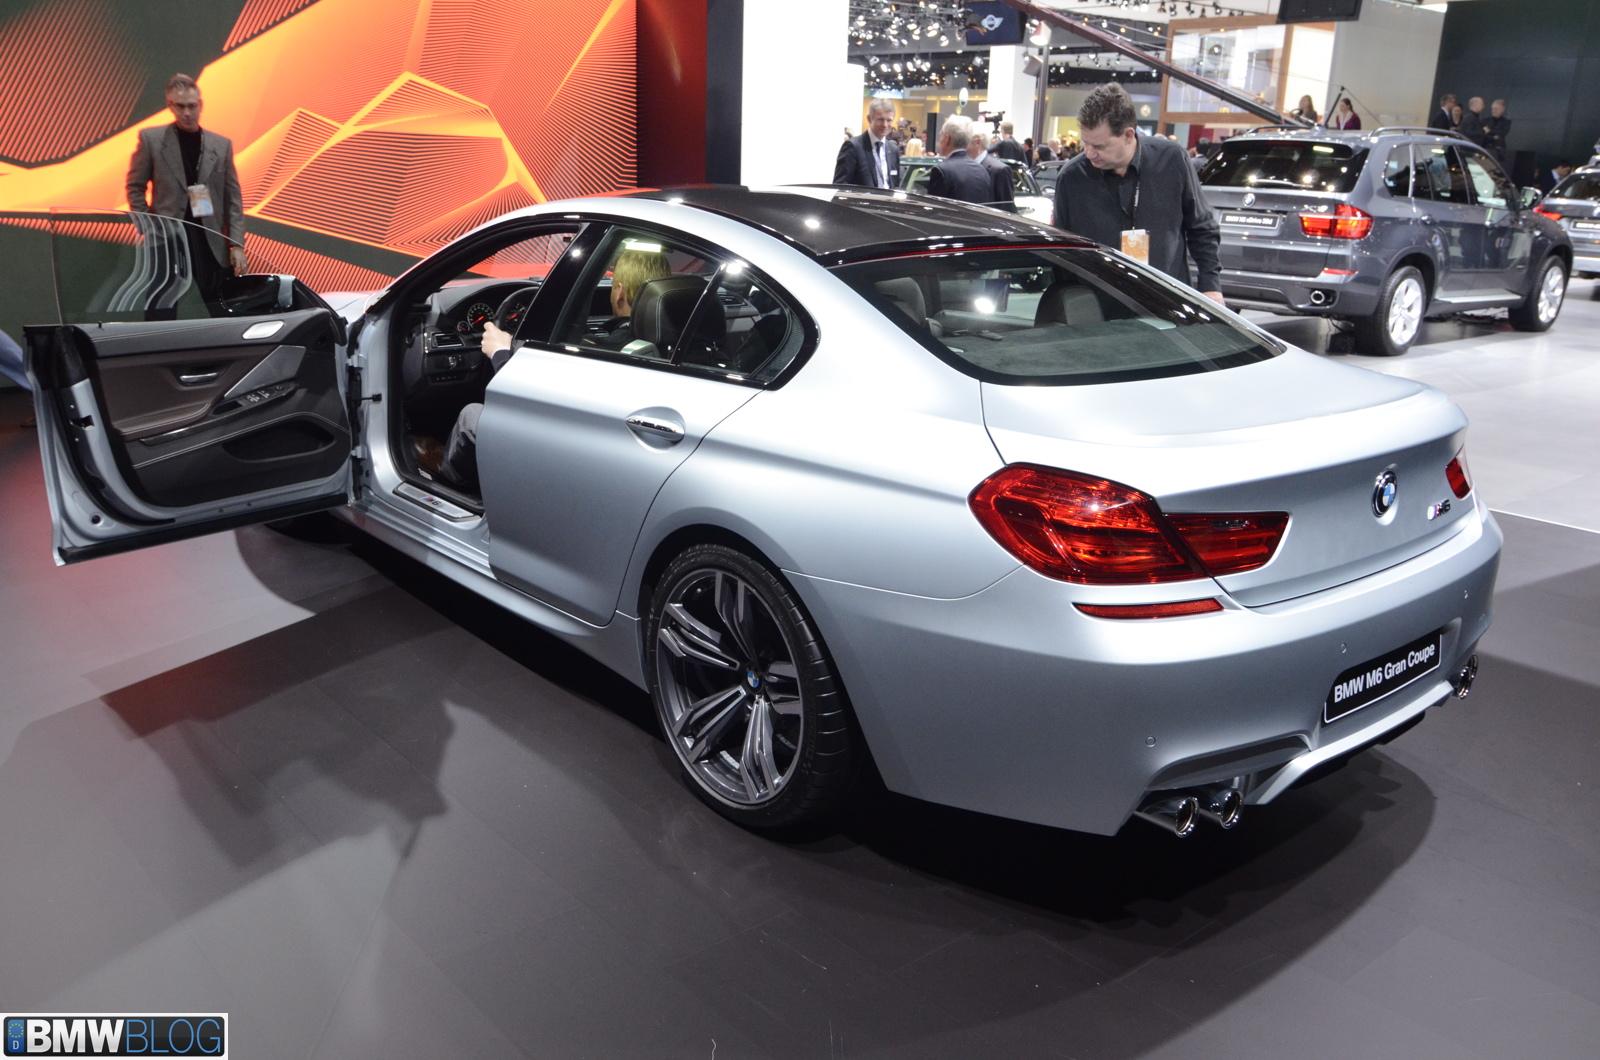 2014 bmw m6 gran coupe 27